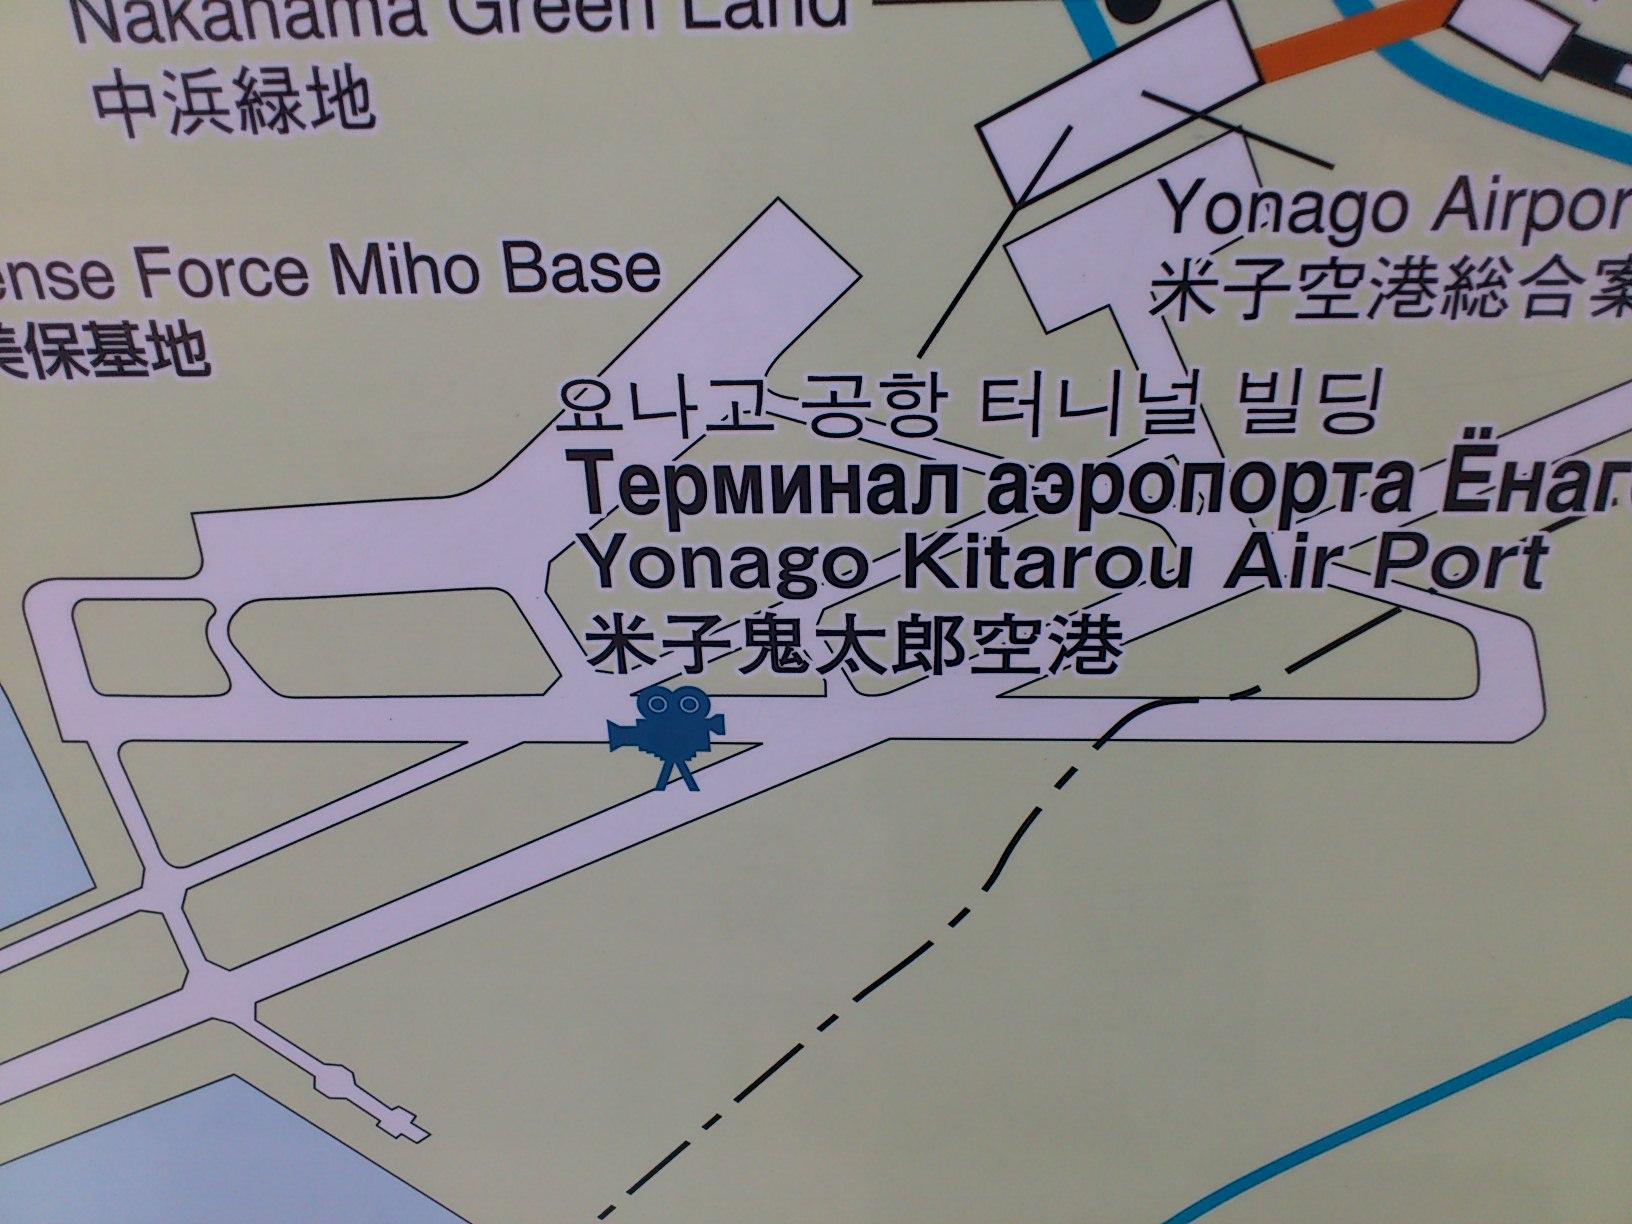 米子は鬼太郎空港